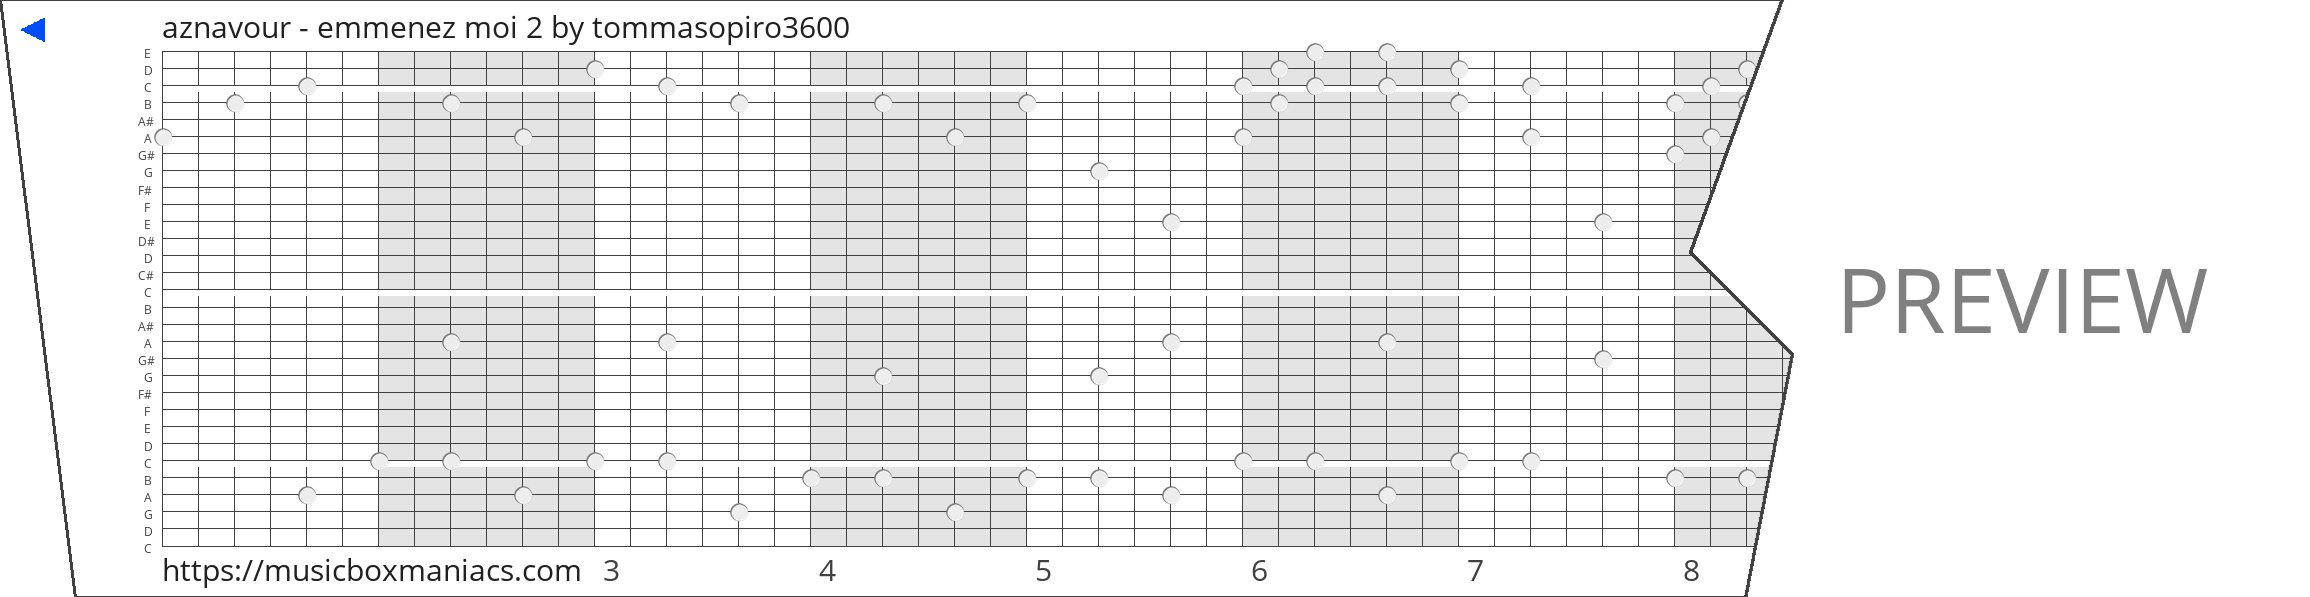 aznavour - emmenez moi 2 30 note music box paper strip